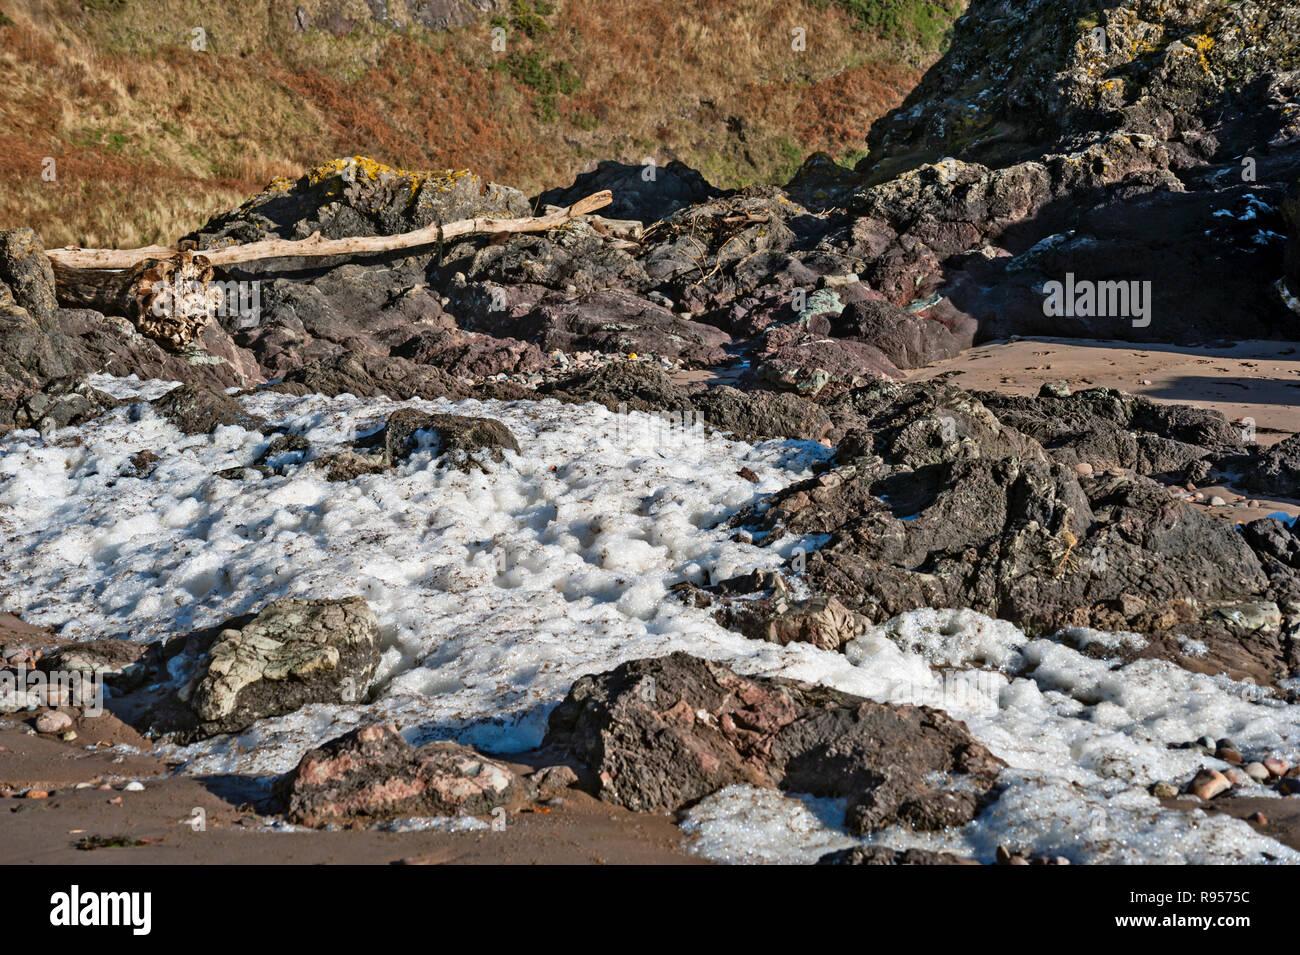 Spume, beach foam, ocean foam or sea foam high on the beach of St,. Cyrus, Aberdeenshire, Scotland after storm. - Stock Image